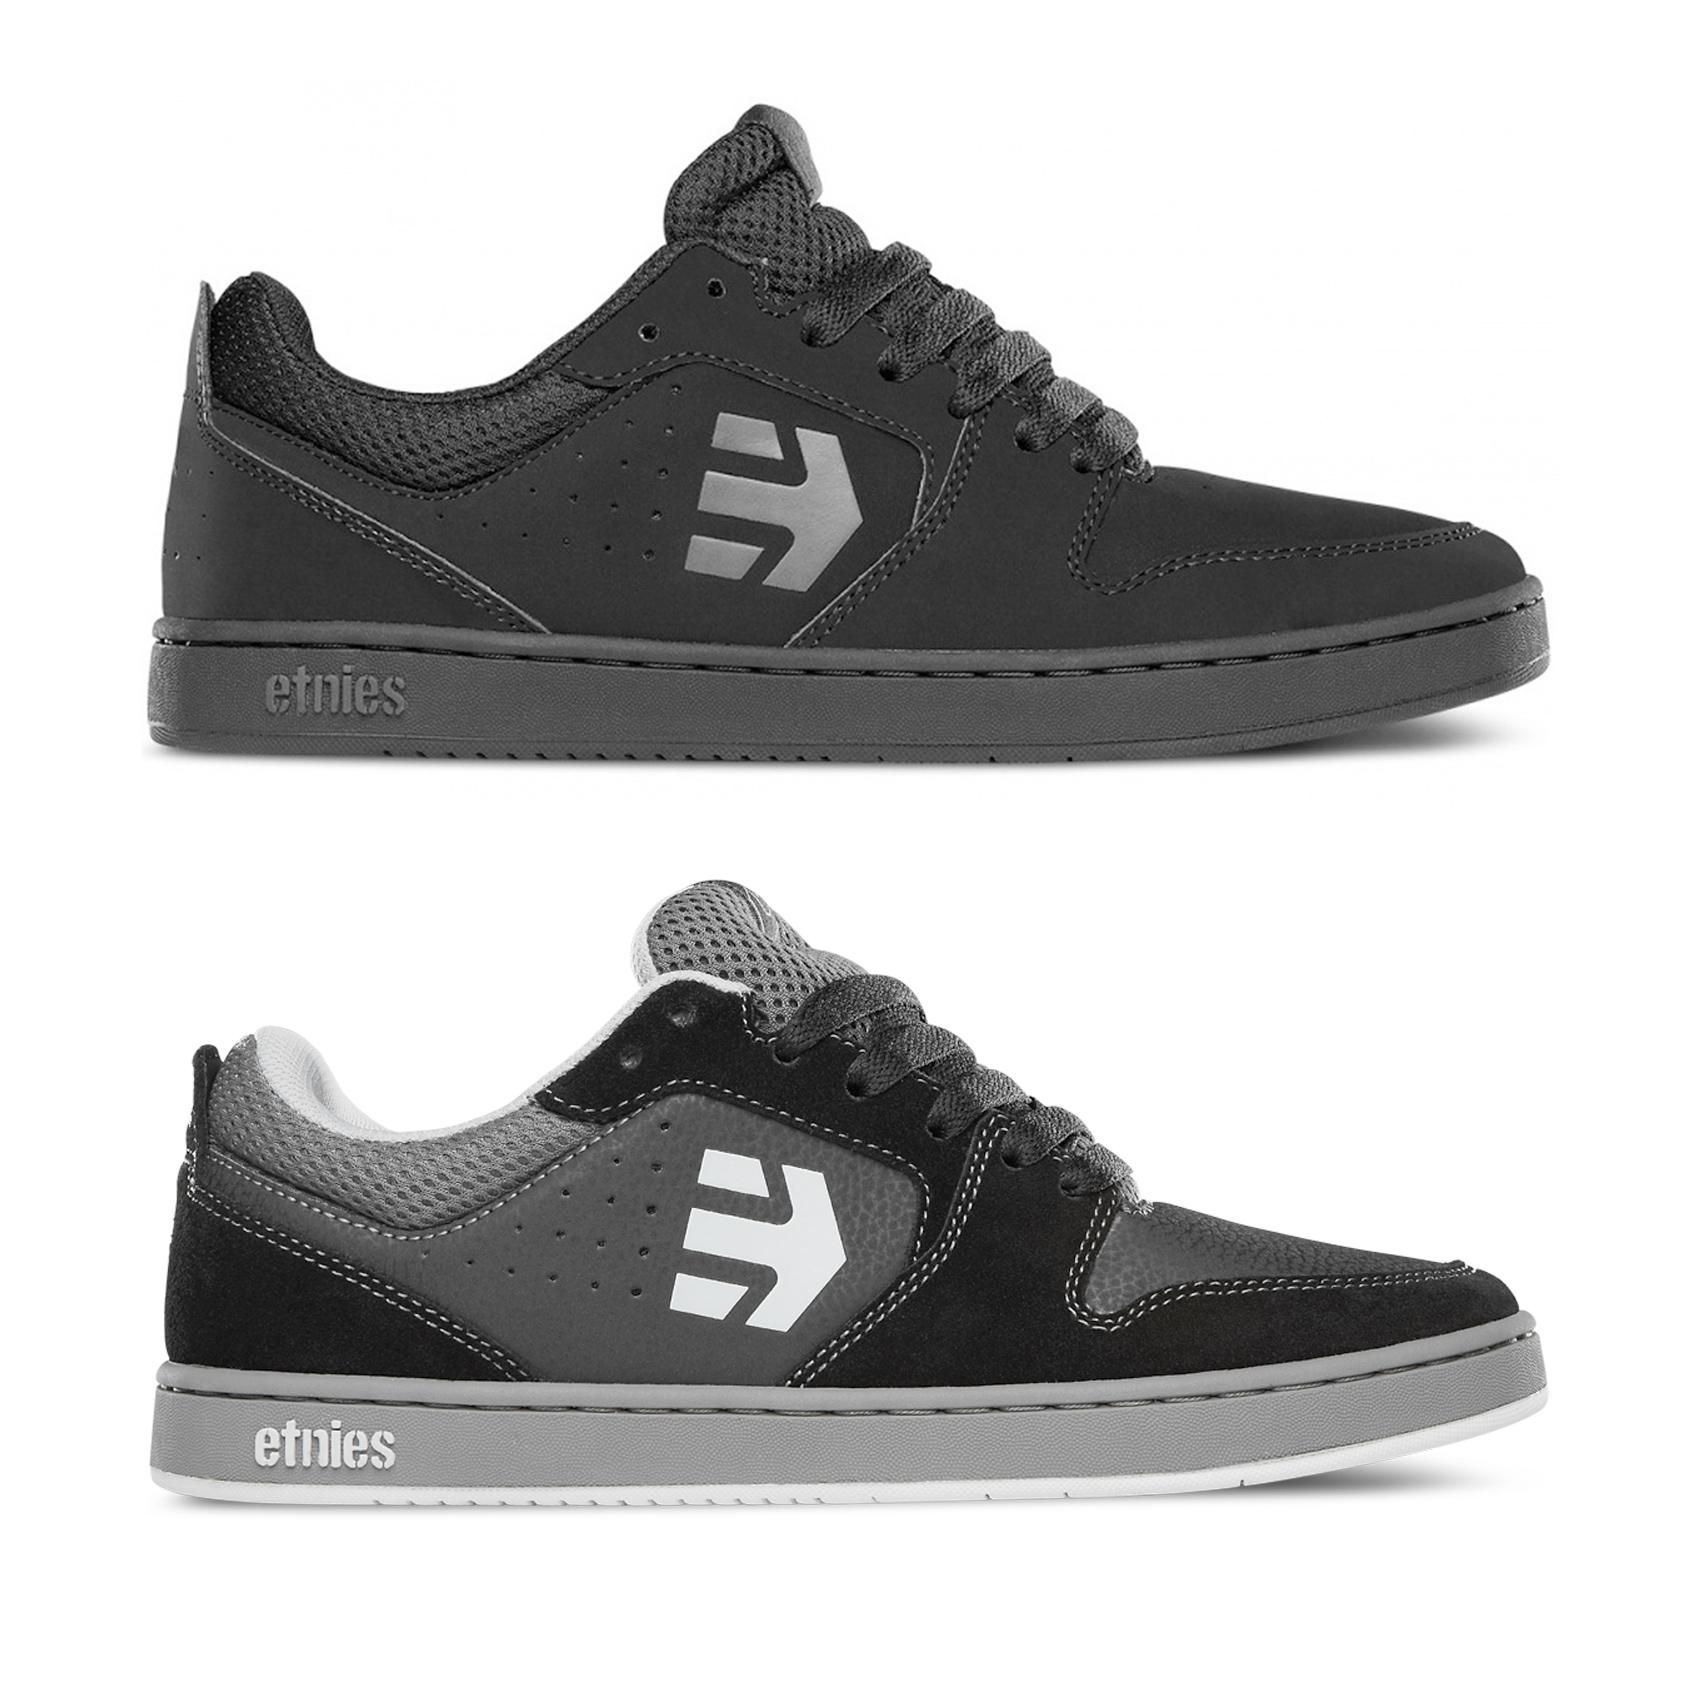 a437decca488 Sentinel Etnies Skate Shoes - Verano - Skateboarding